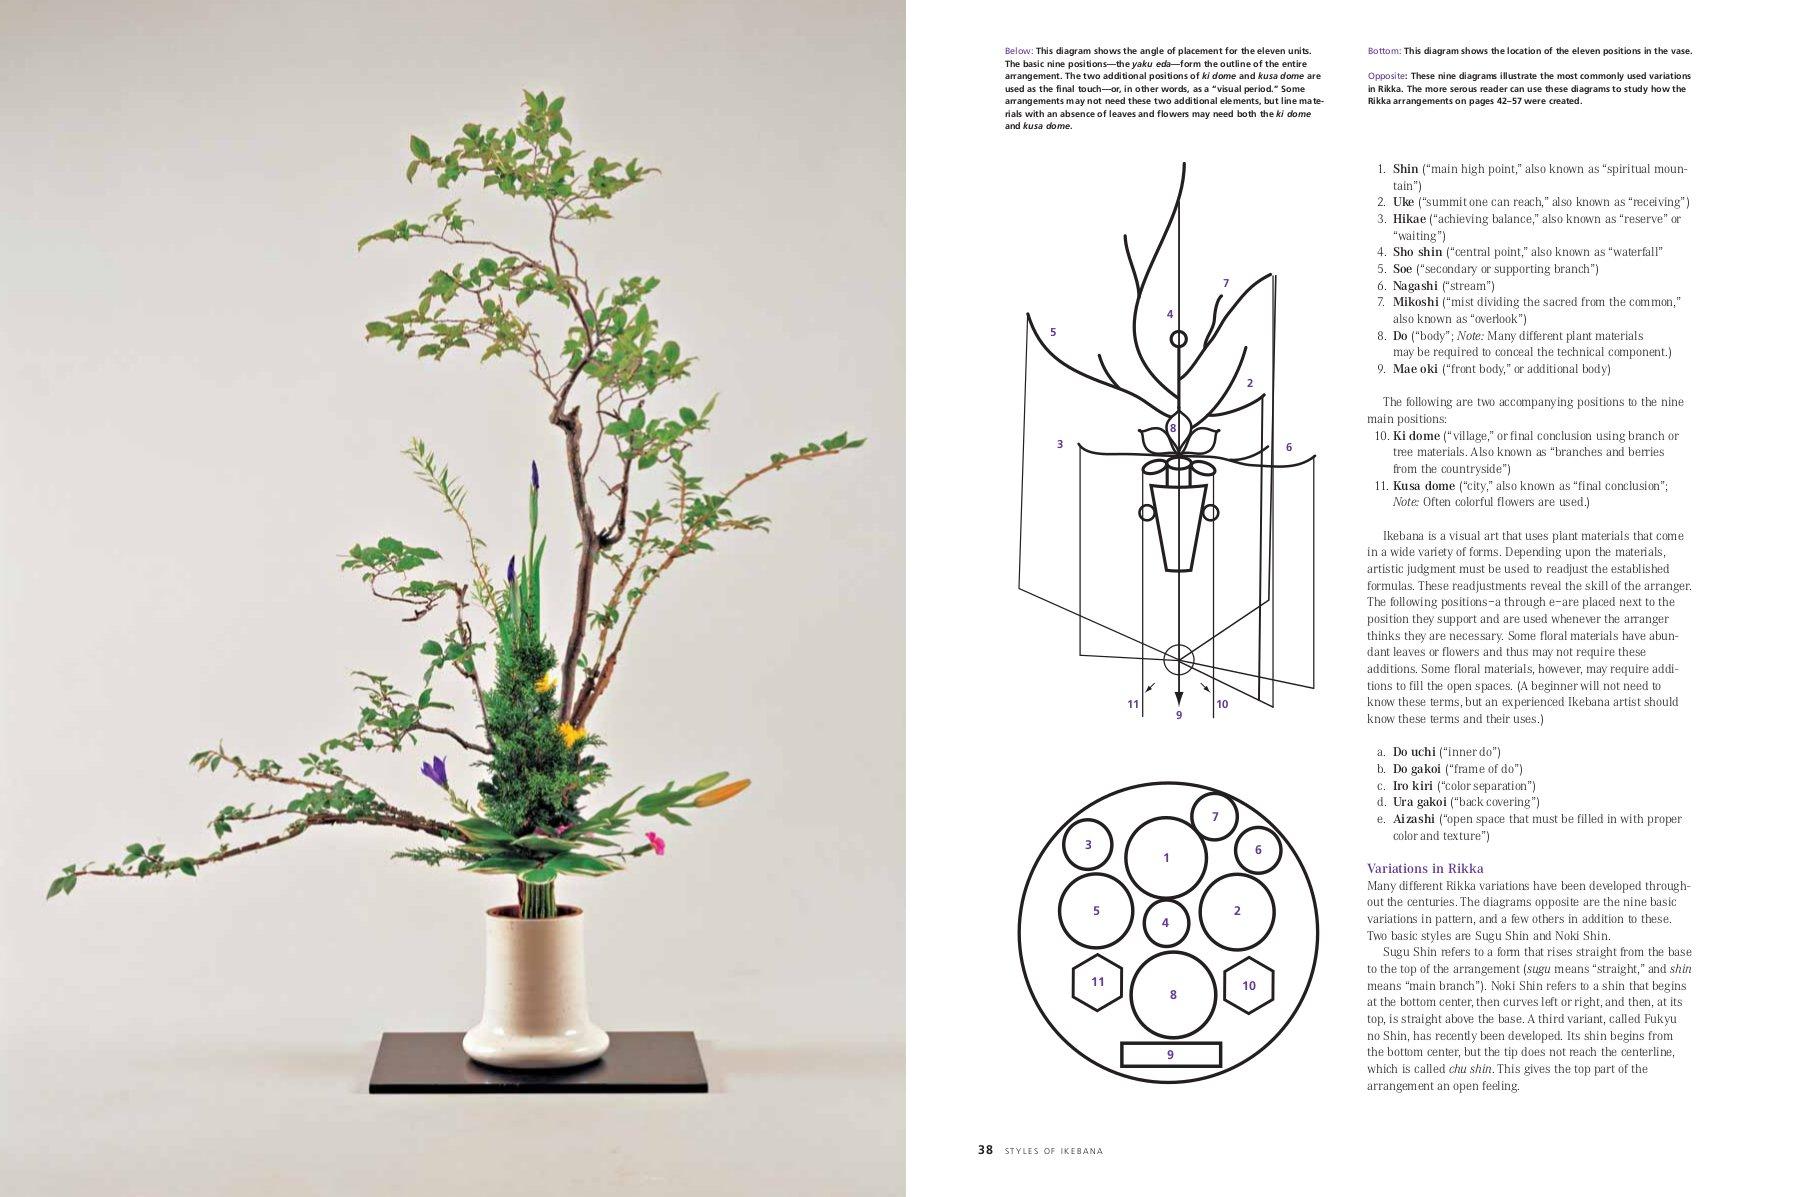 Ikebana The Art Of Arranging Flowers Sato Shozo Yoshimura Kasen 9784805309438 Amazon Com Books